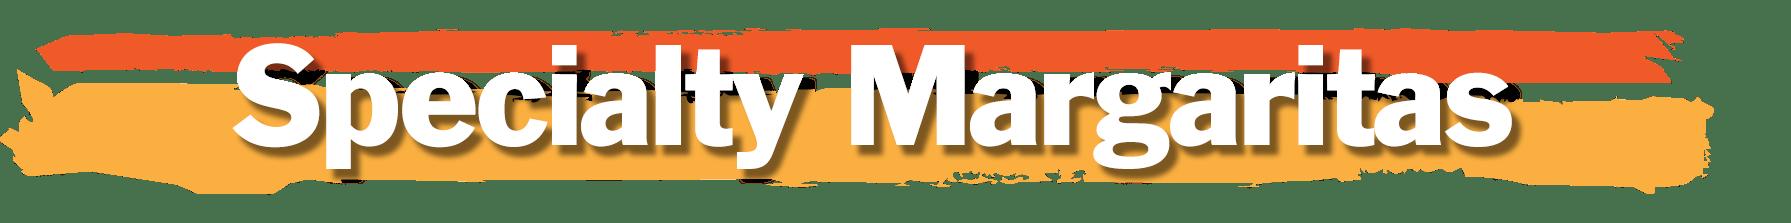 specialty margaritas menu graphic